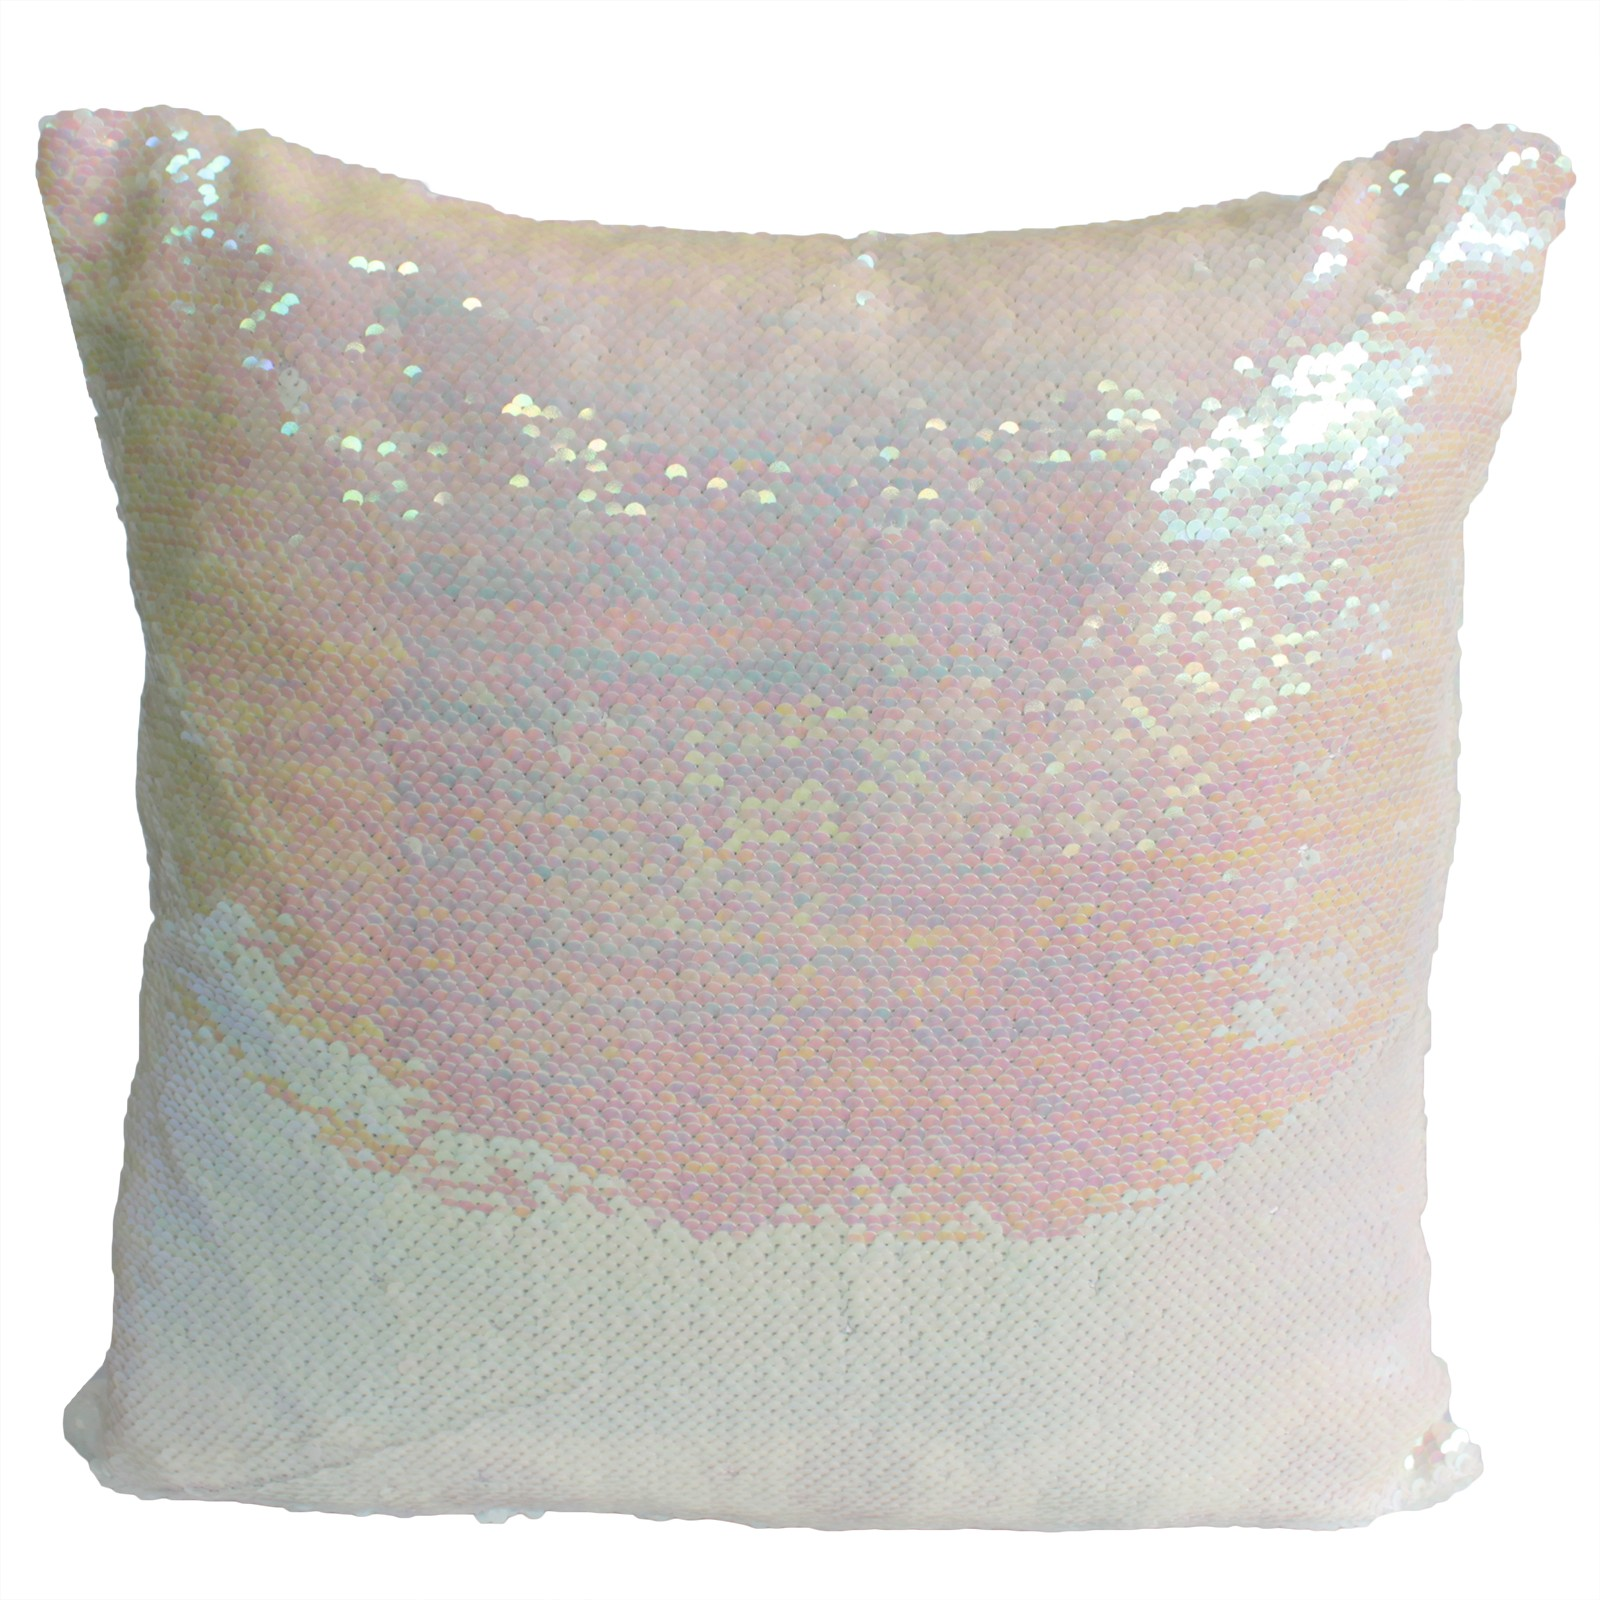 2x Mermaid Cushion Covers -Pink Champagne & Snow